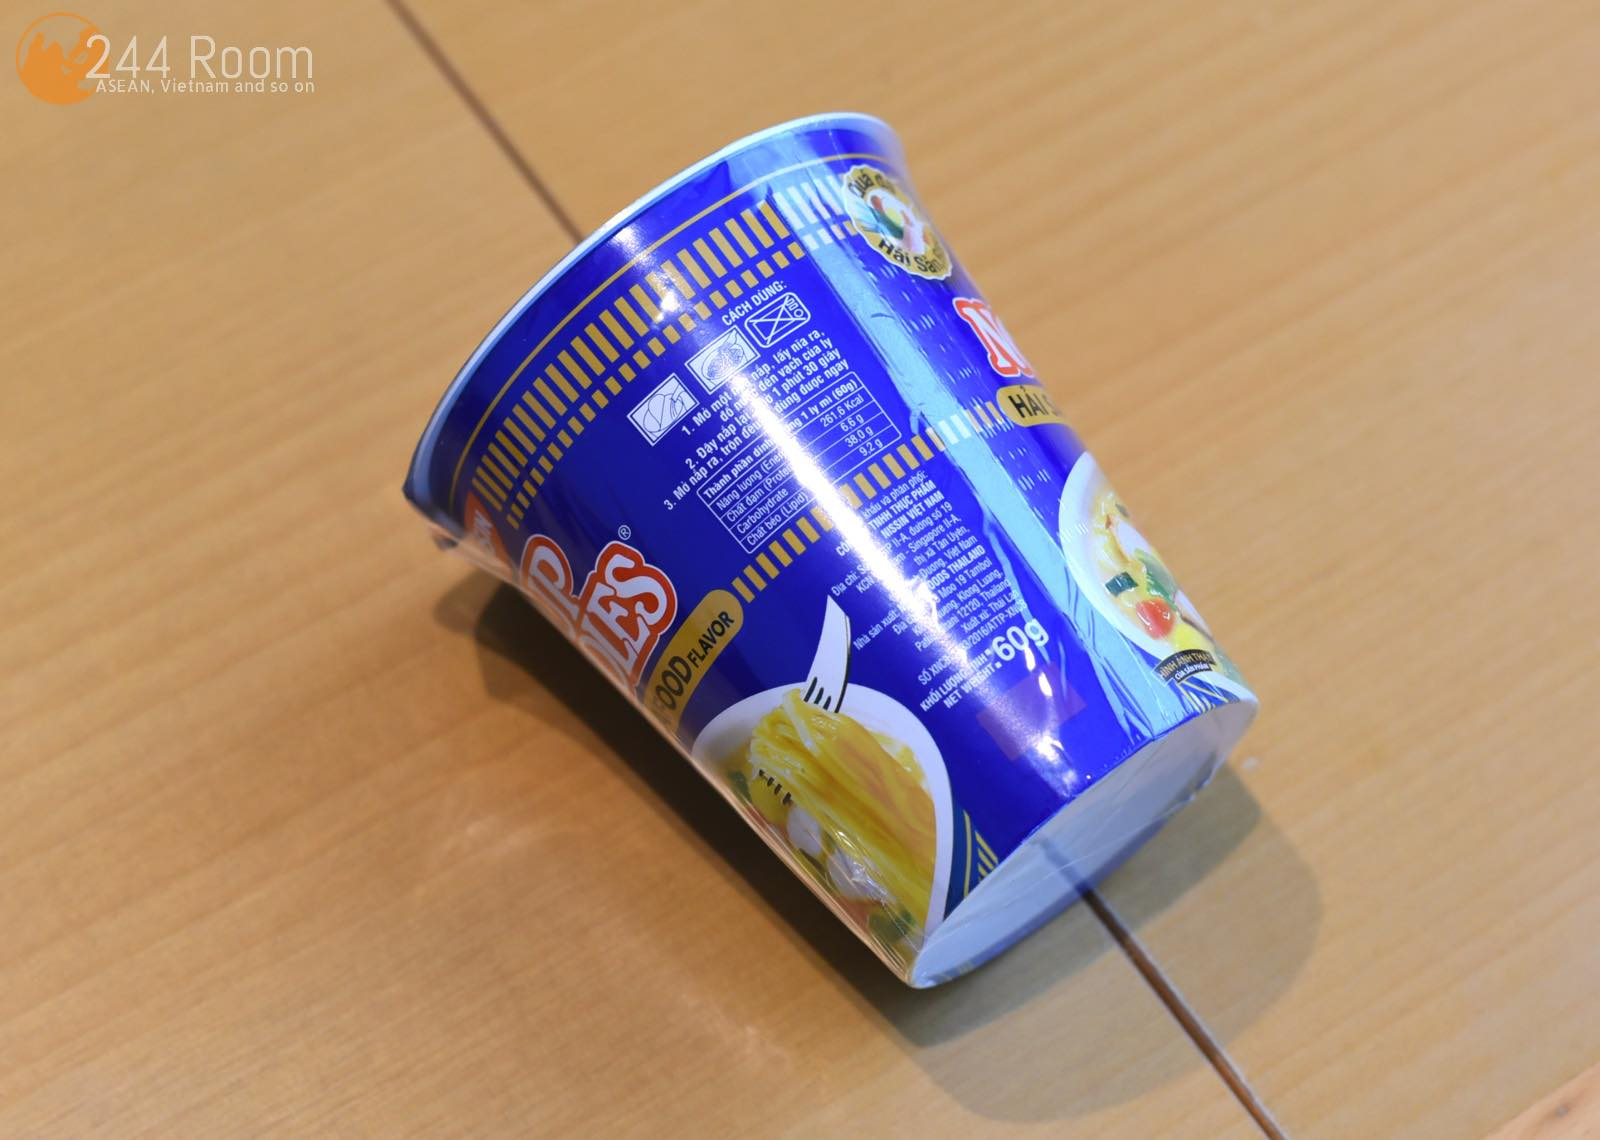 Vietnam-cupnoodles-seafood ベトナムカップヌードル4